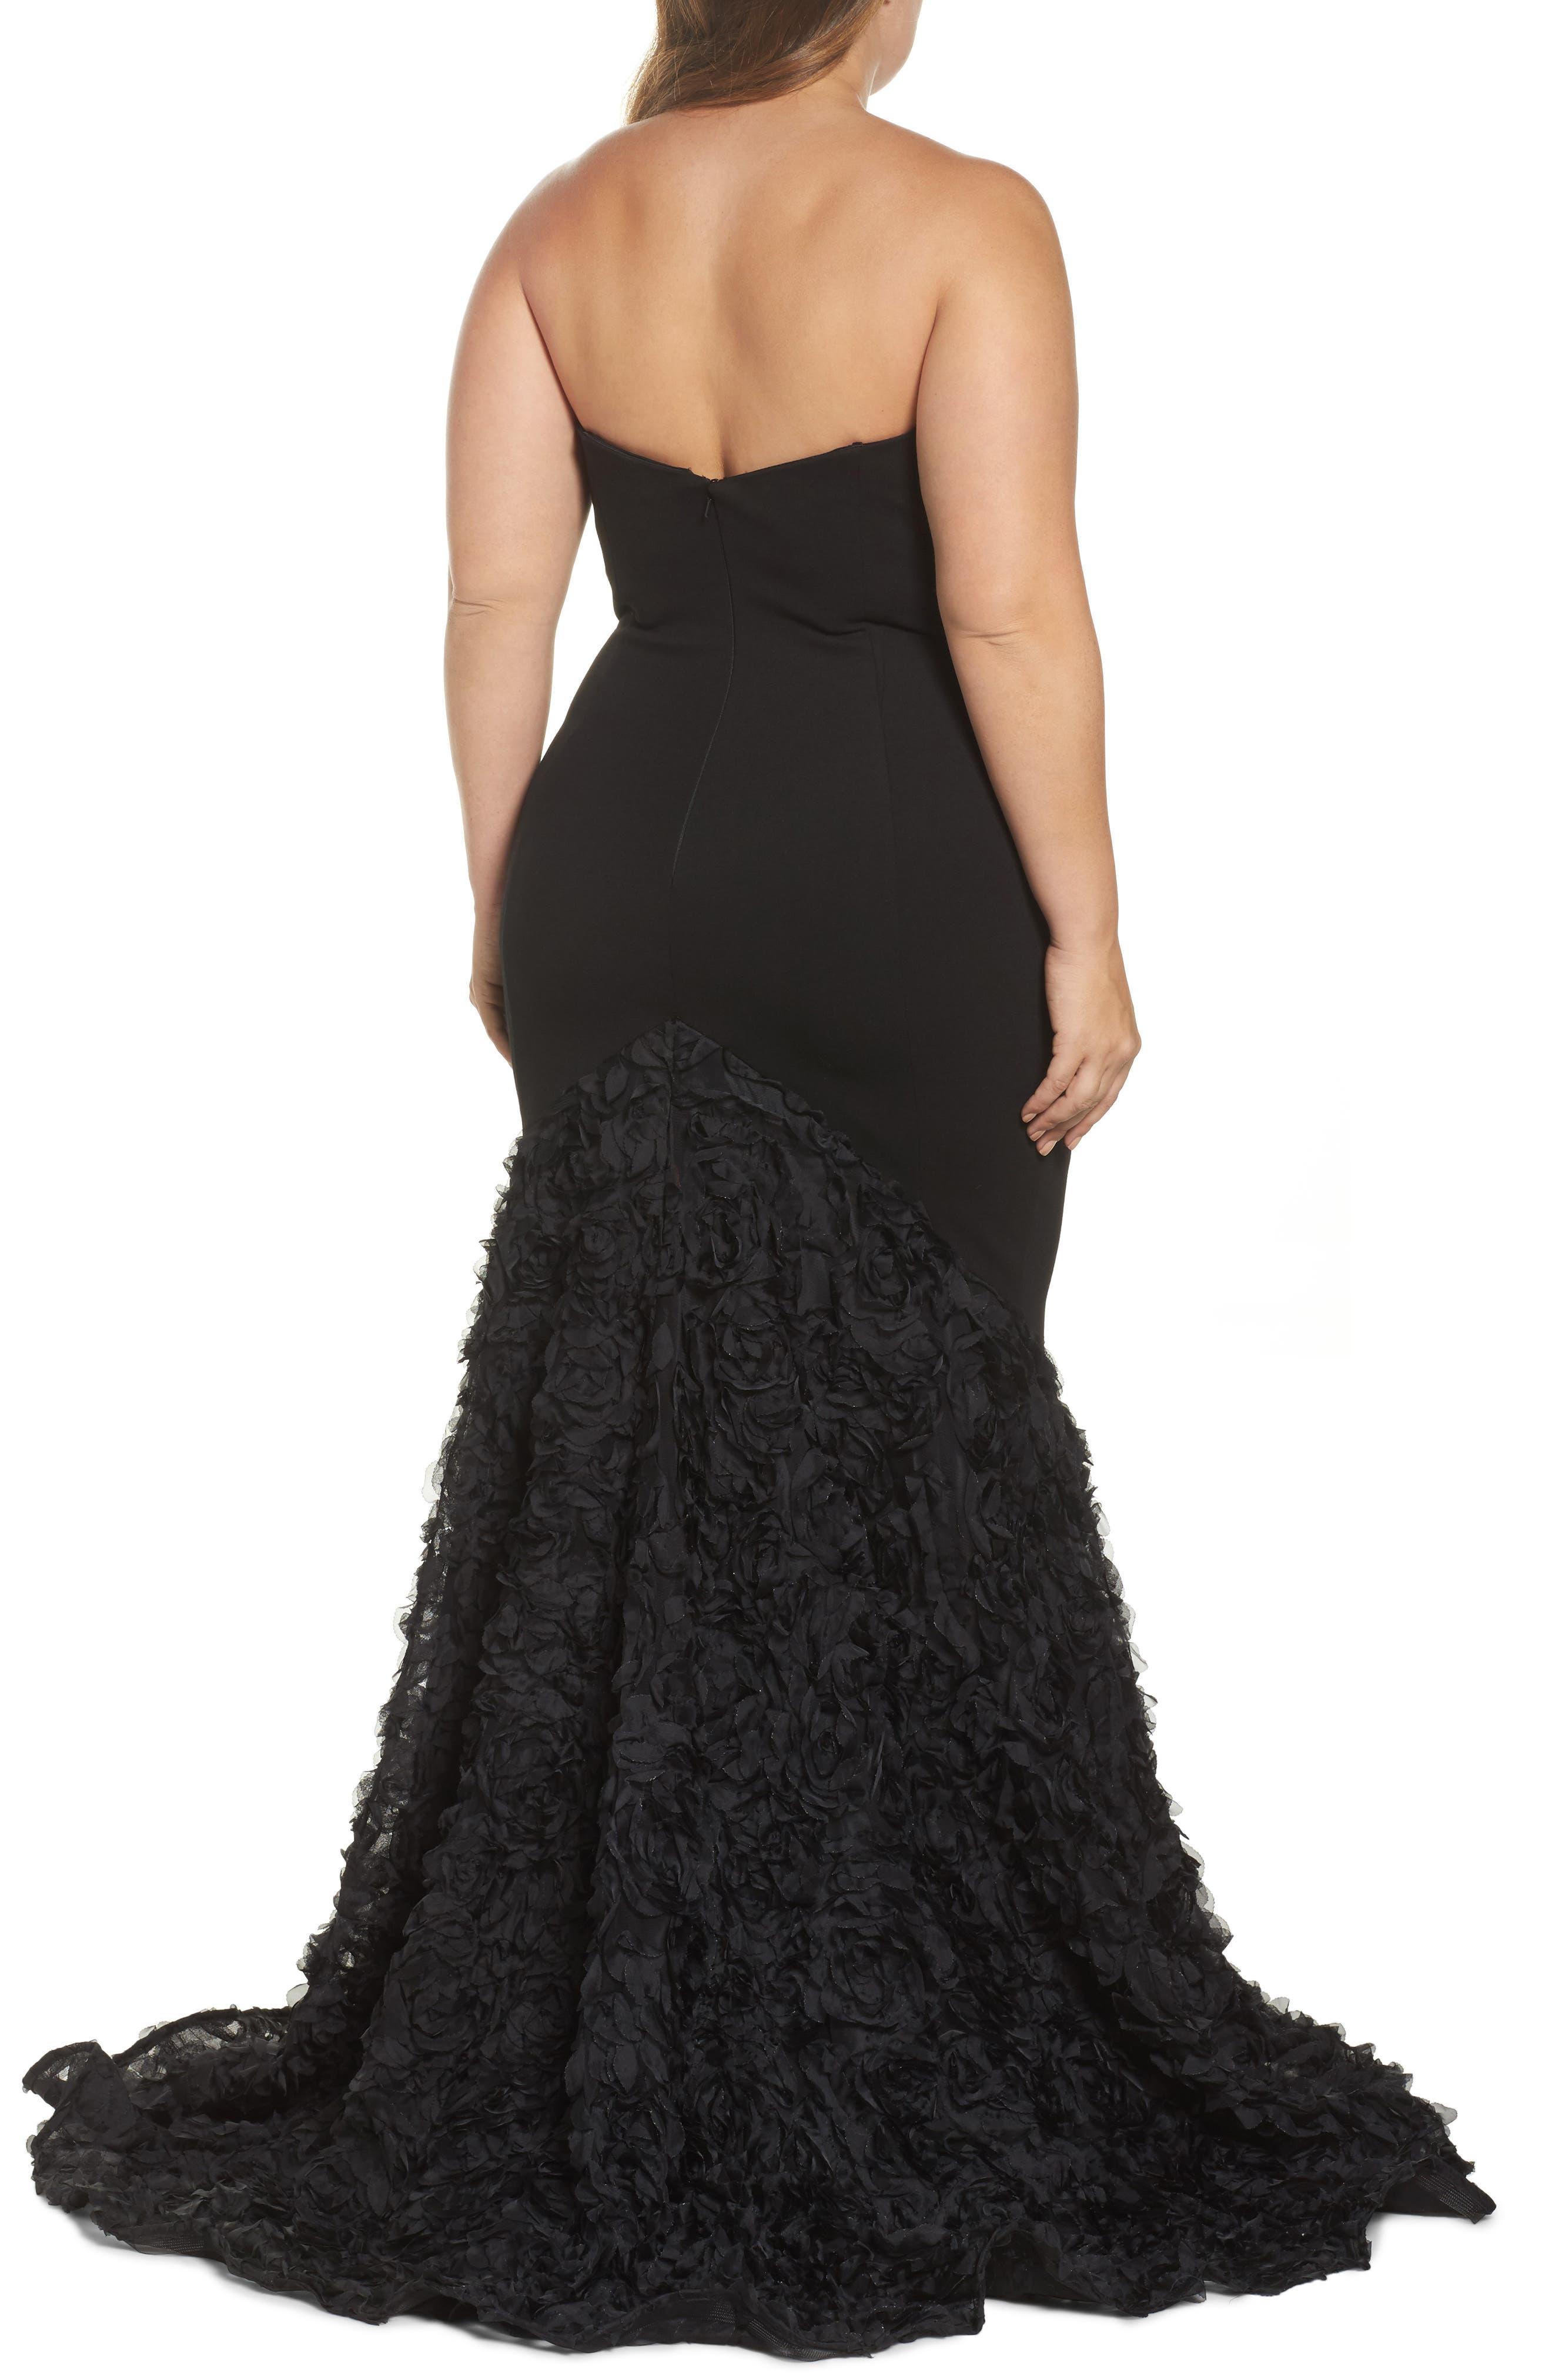 MAC DUGGAL, Strapless Bustier Rosette Gown, Alternate thumbnail 2, color, BLACK